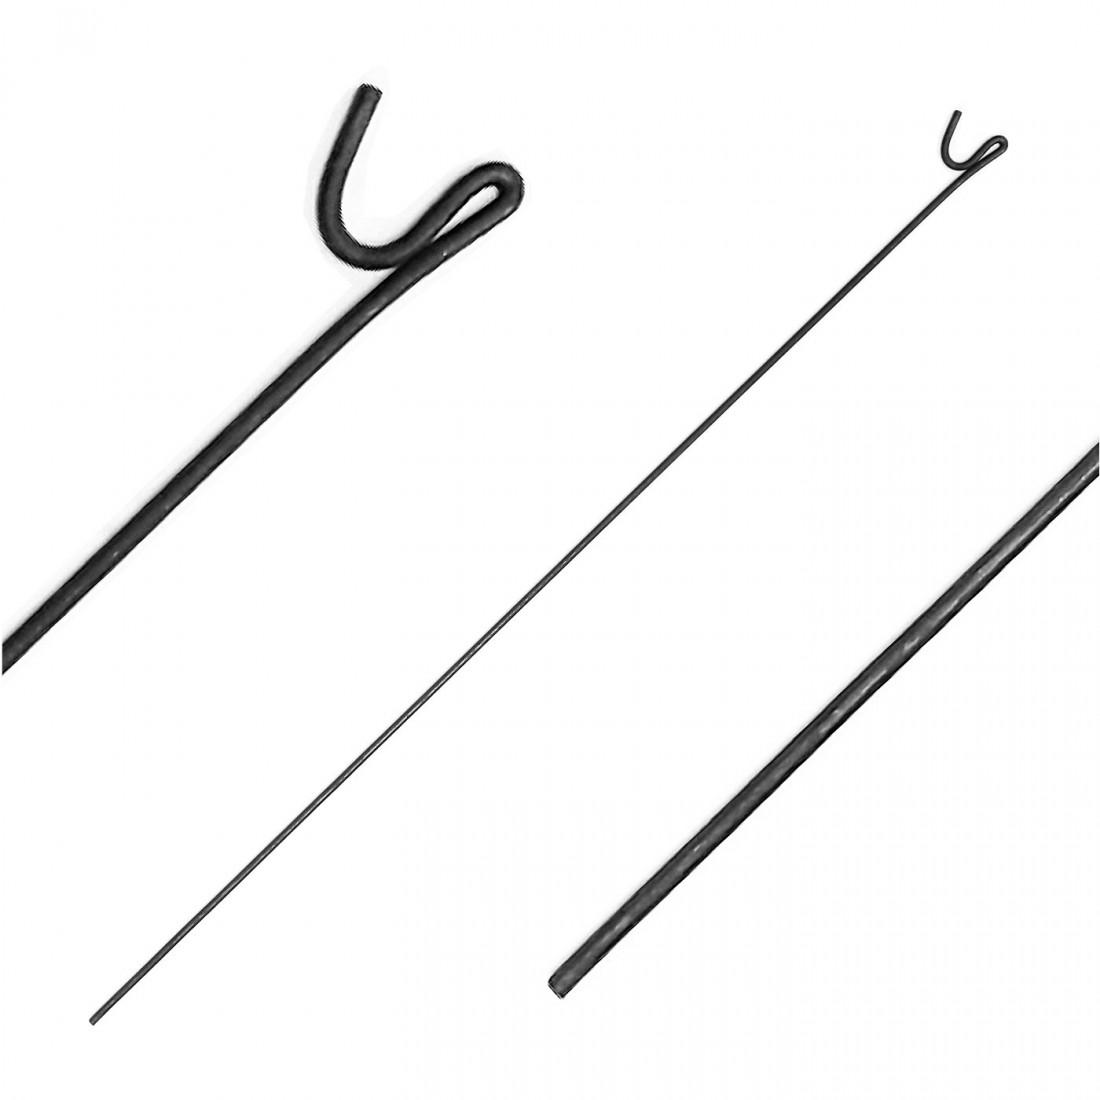 Steel Fencing Pins - 8mm